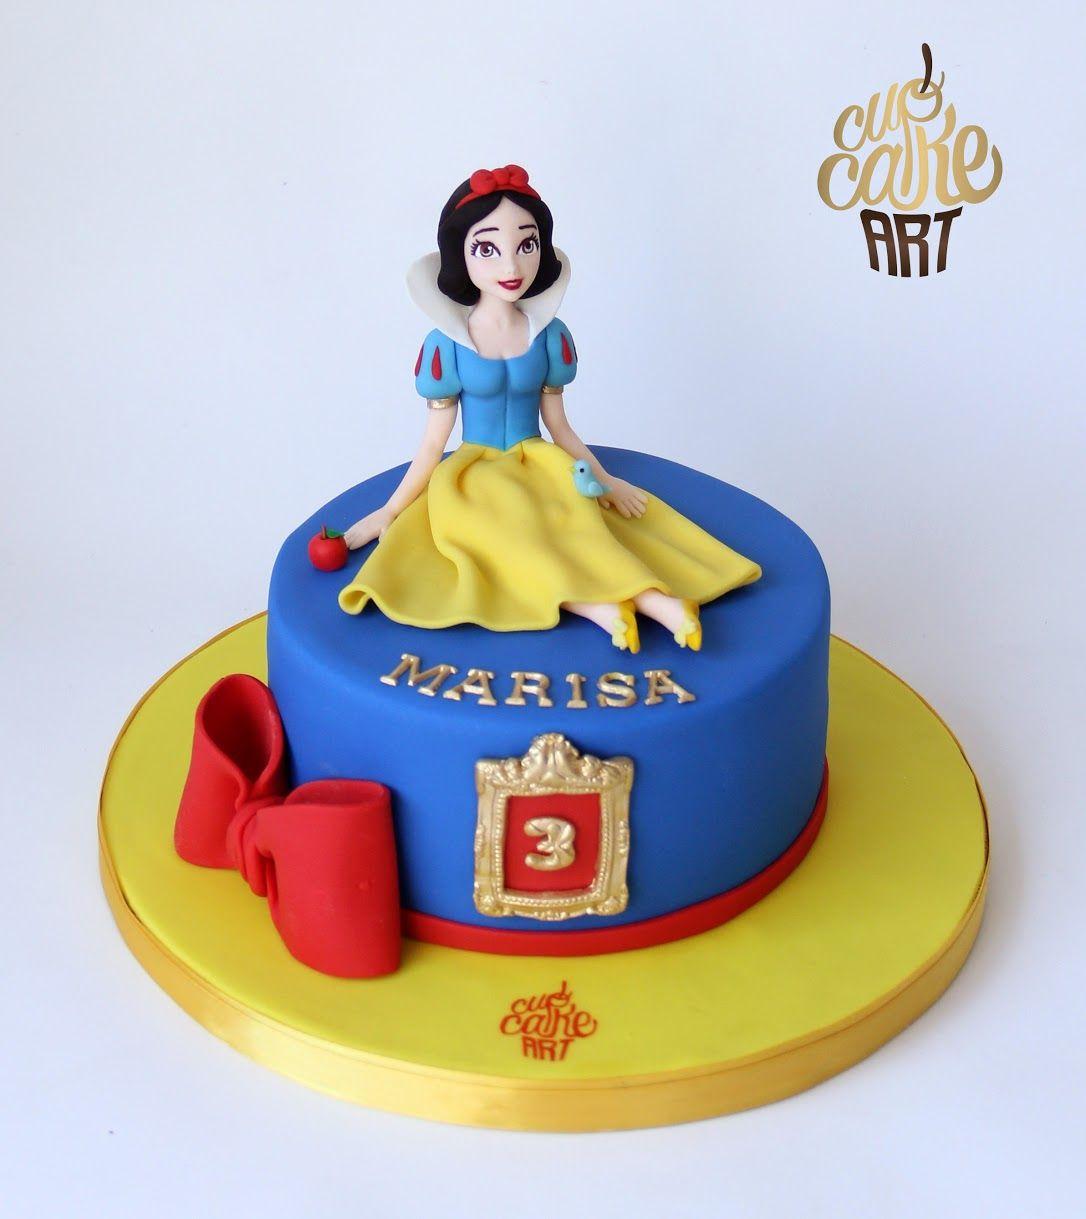 Tremendous Birthday Girl With Images White Birthday Cakes Disney Funny Birthday Cards Online Alyptdamsfinfo